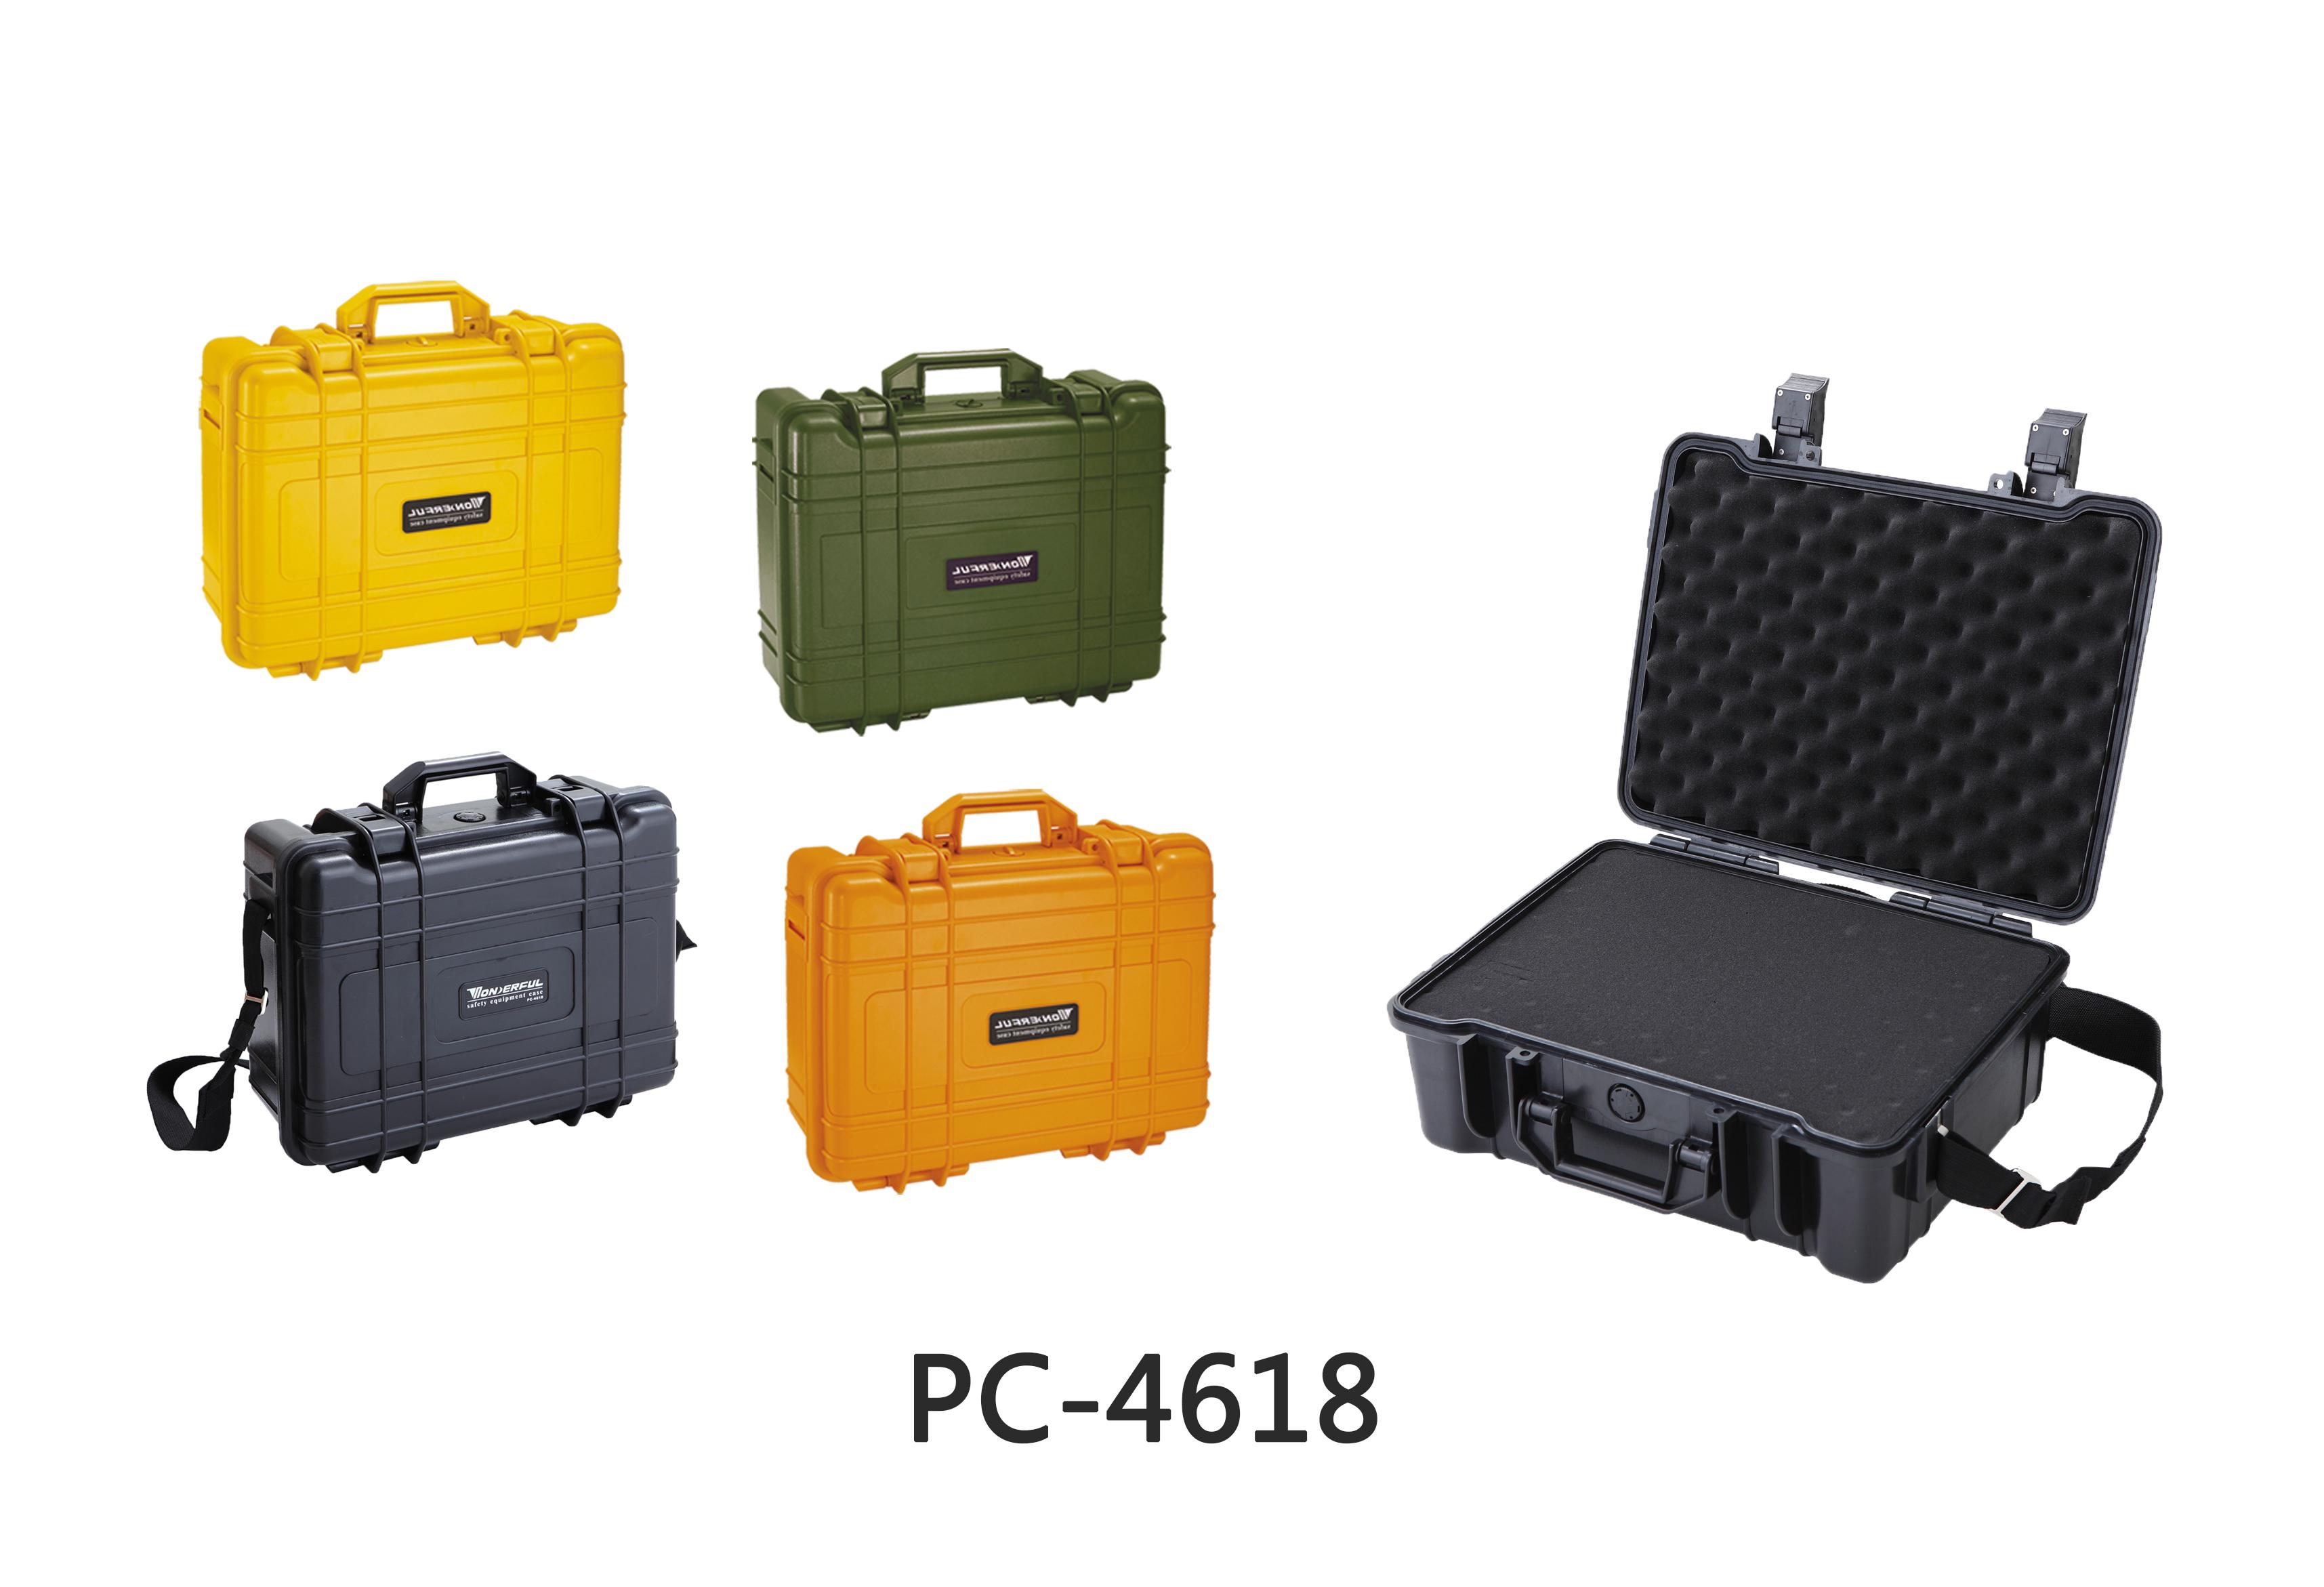 WONDERFUL 萬得福 PC-4618 氣密箱